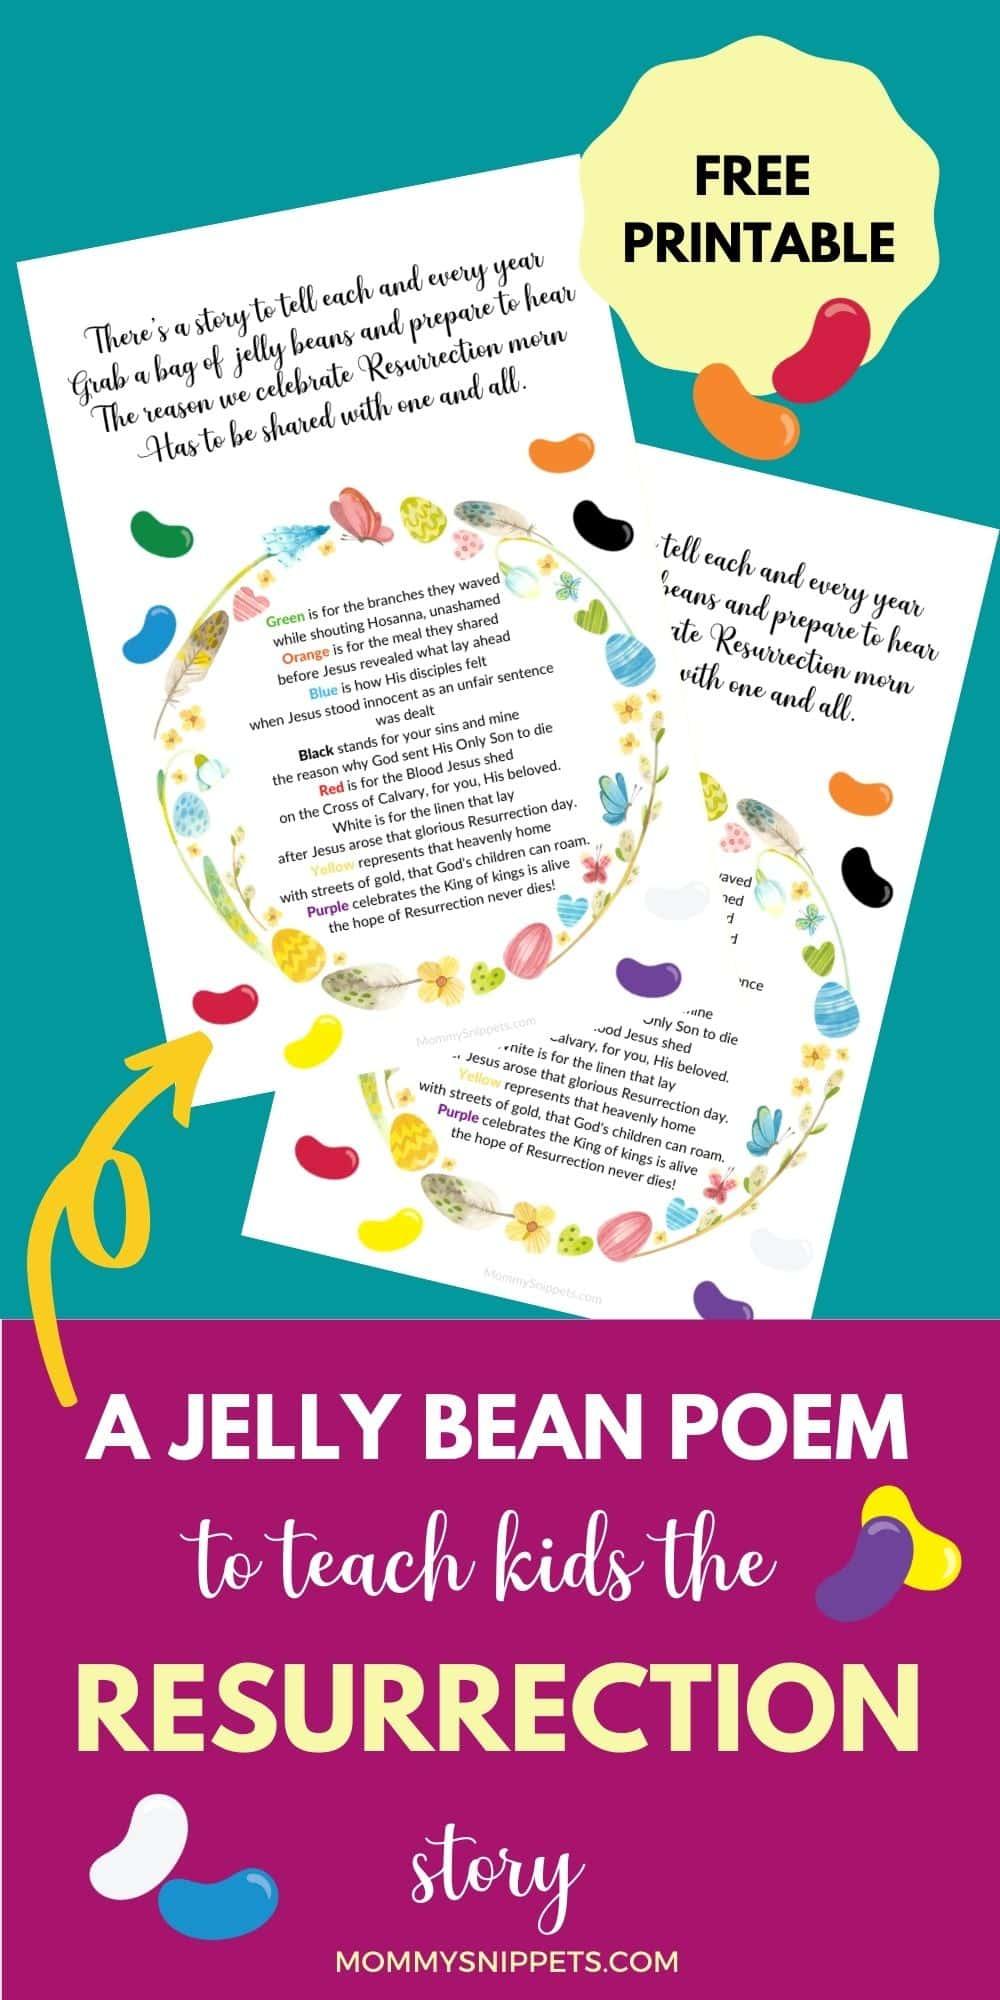 The Jelly Bean Poem Teaches Kids Why We Celebrate Resurrection Sunday (Free Printable)